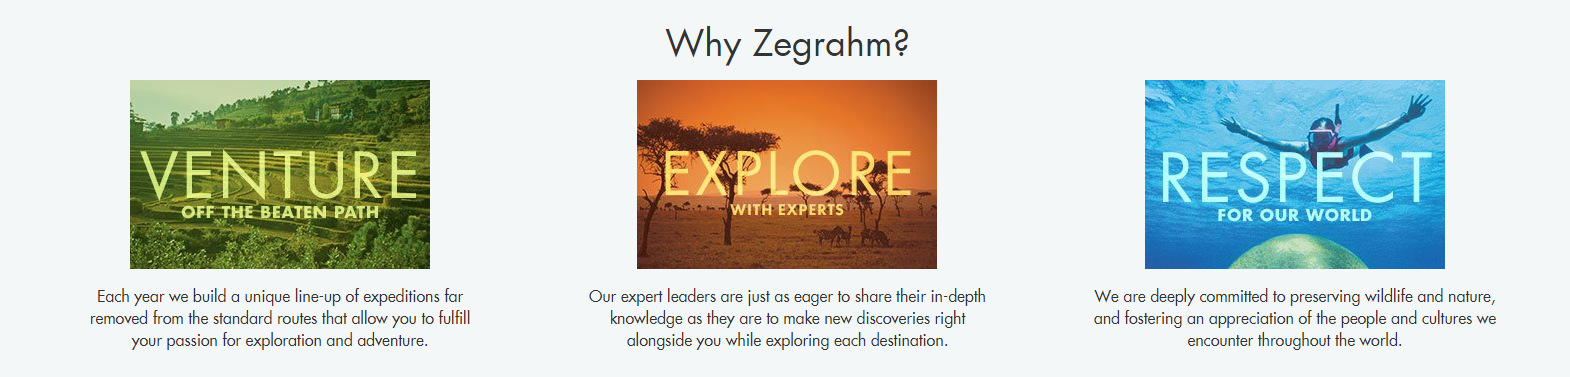 Travel Africa, Africa Safari Guide, Luxury African Safari, zegrahm expeditions